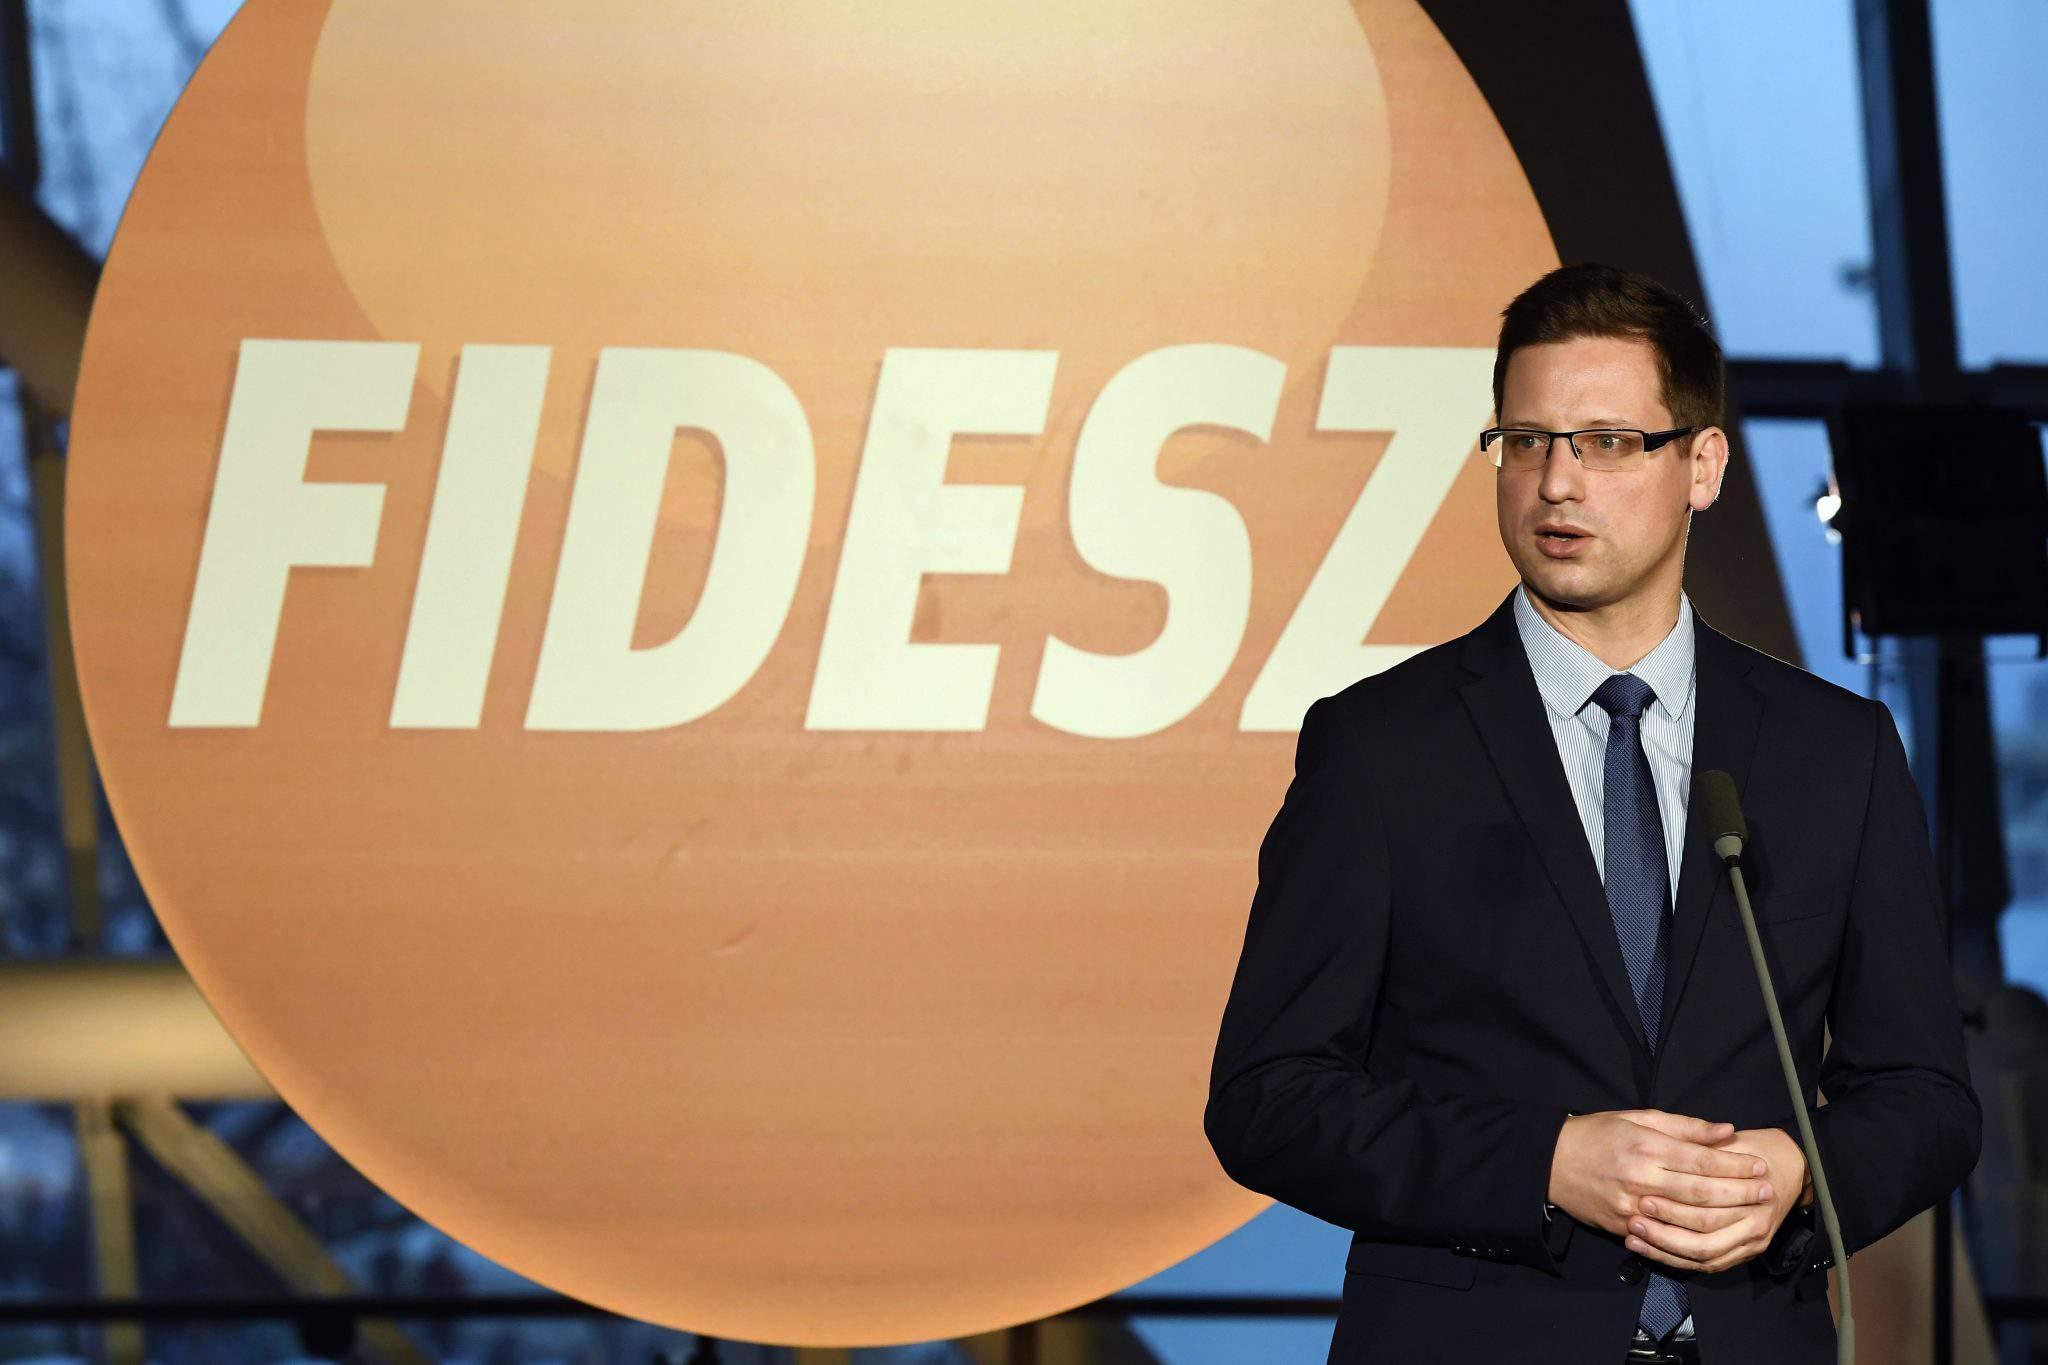 gergely gulyás fidesz election